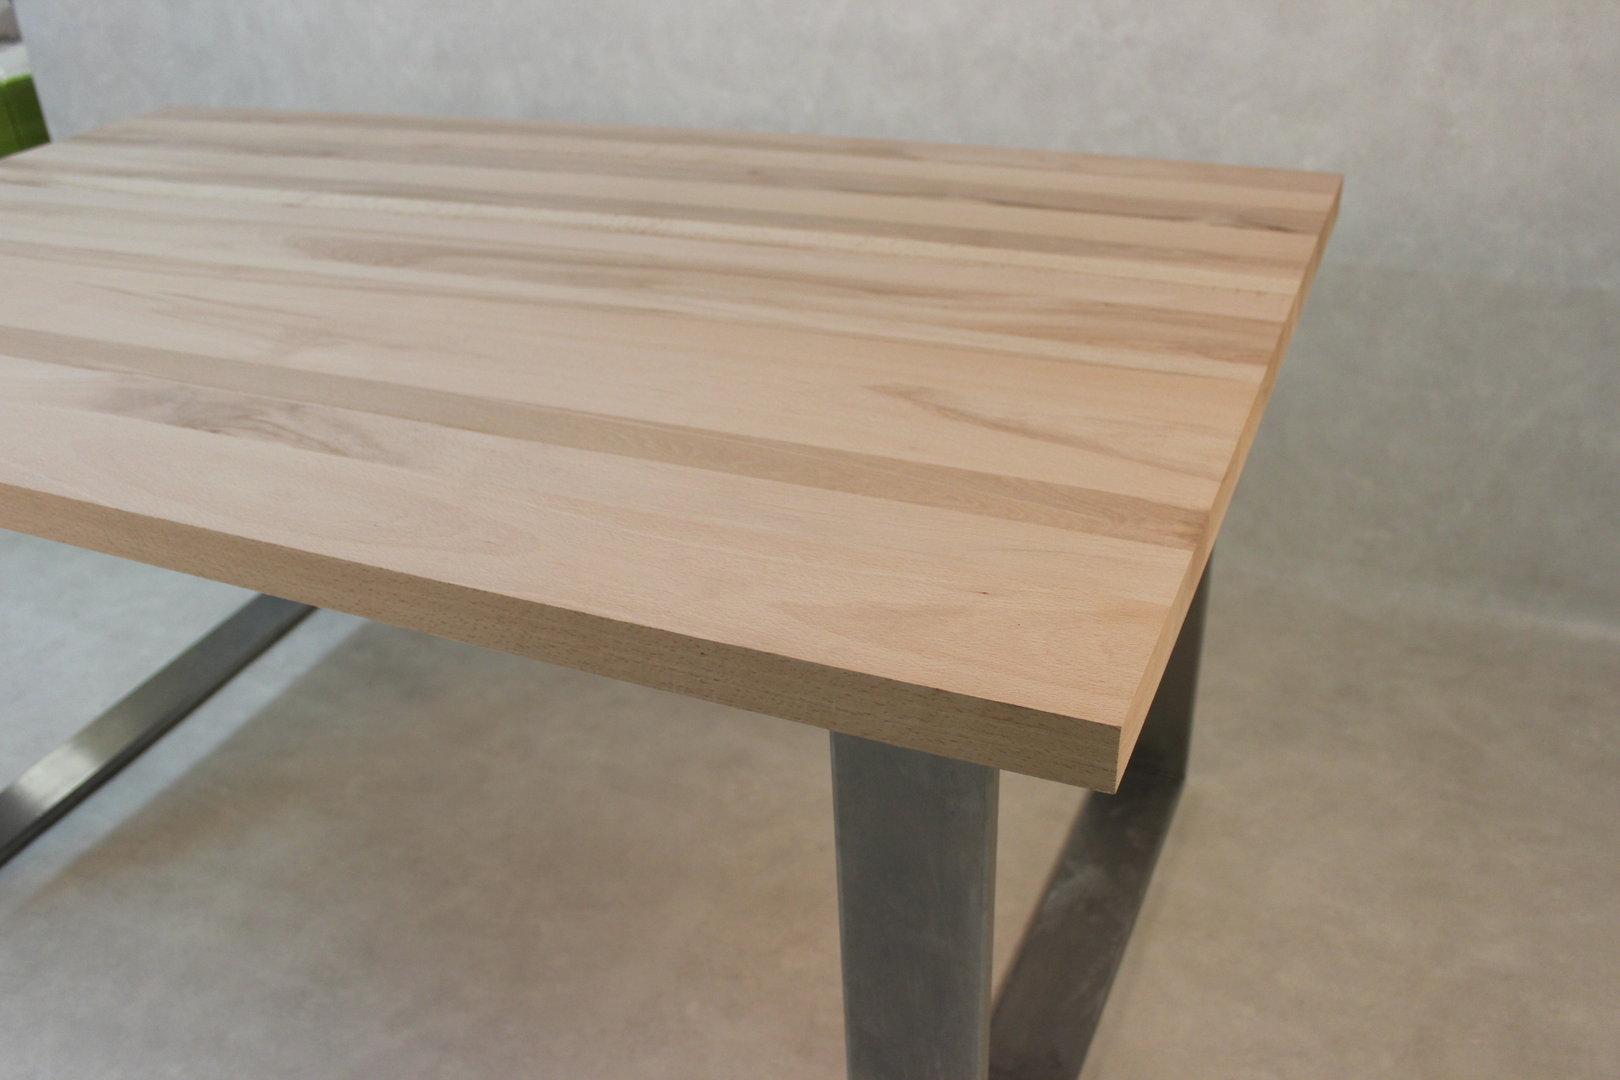 Tischplatte massivholz kernbuche dl fsc 40 x diverse for Massivholz tischplatte